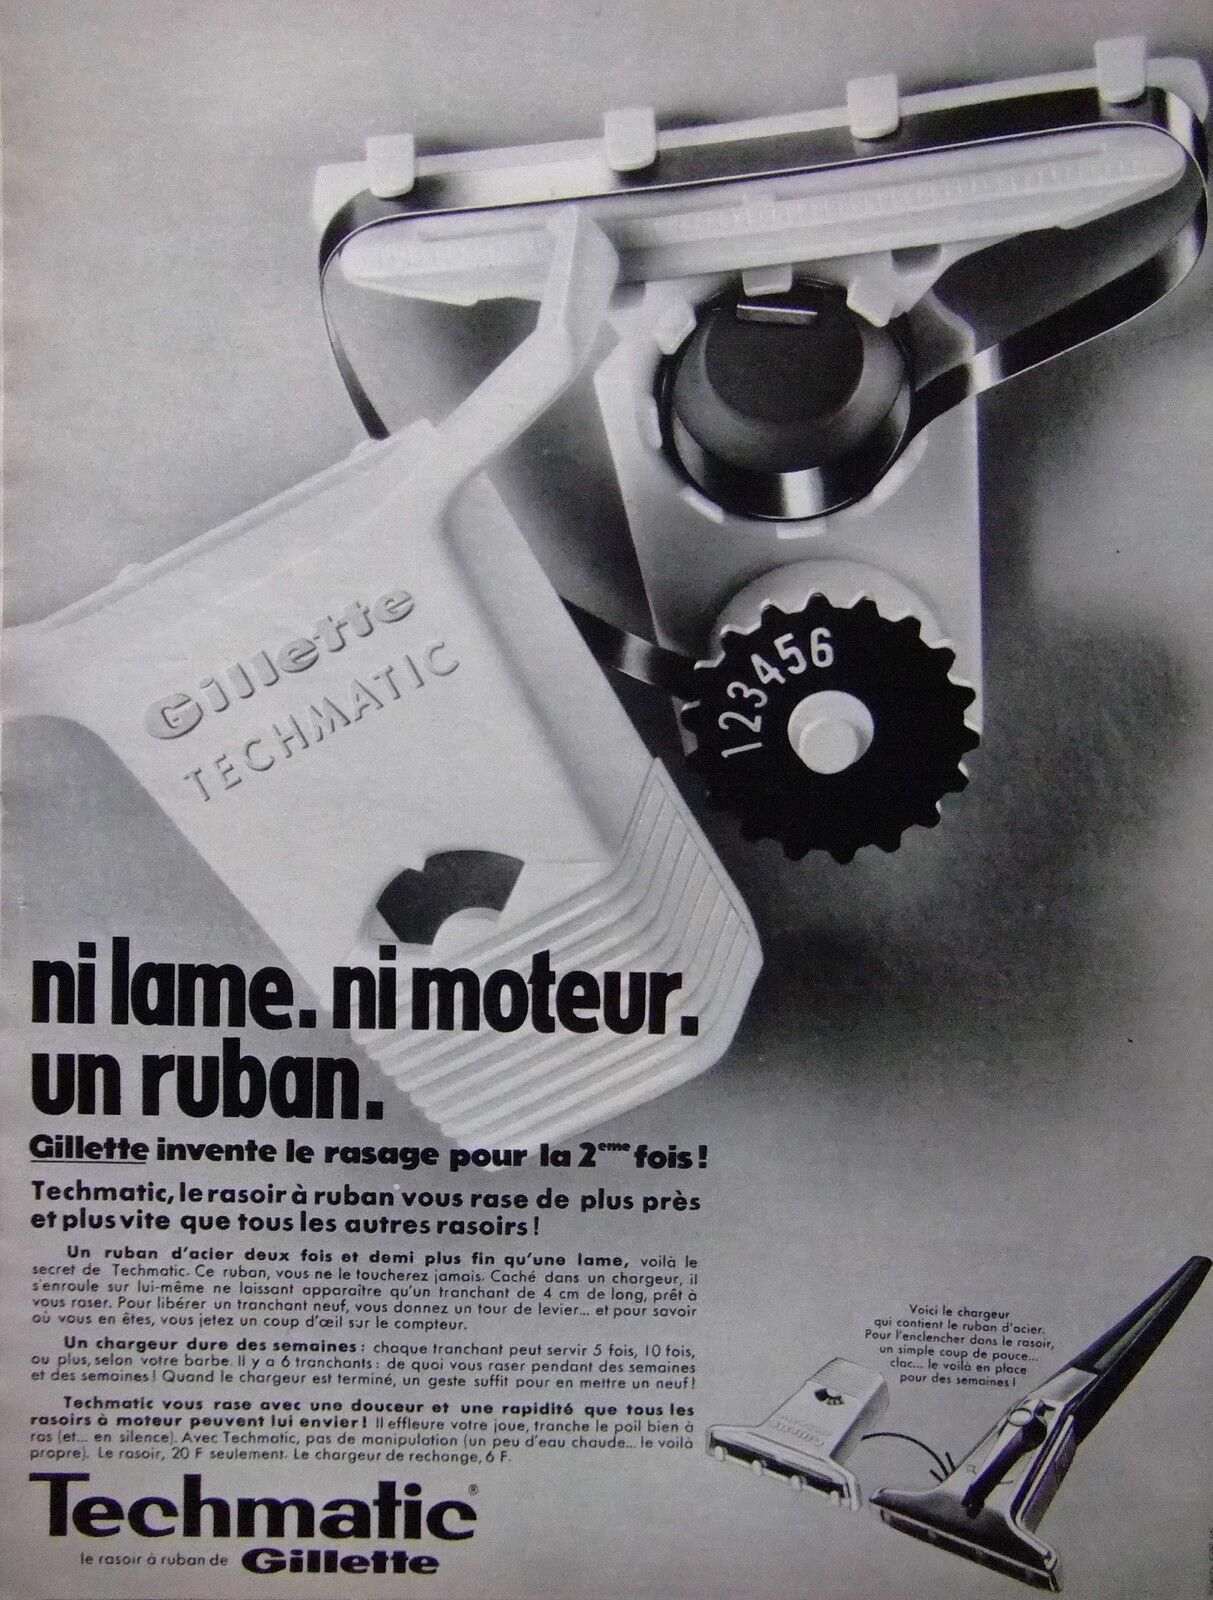 Gillette Techmatic - Schick Instamatic $(KGrHqN,!iEFBN)nnZKmBQjBbMKziQ~~60_57